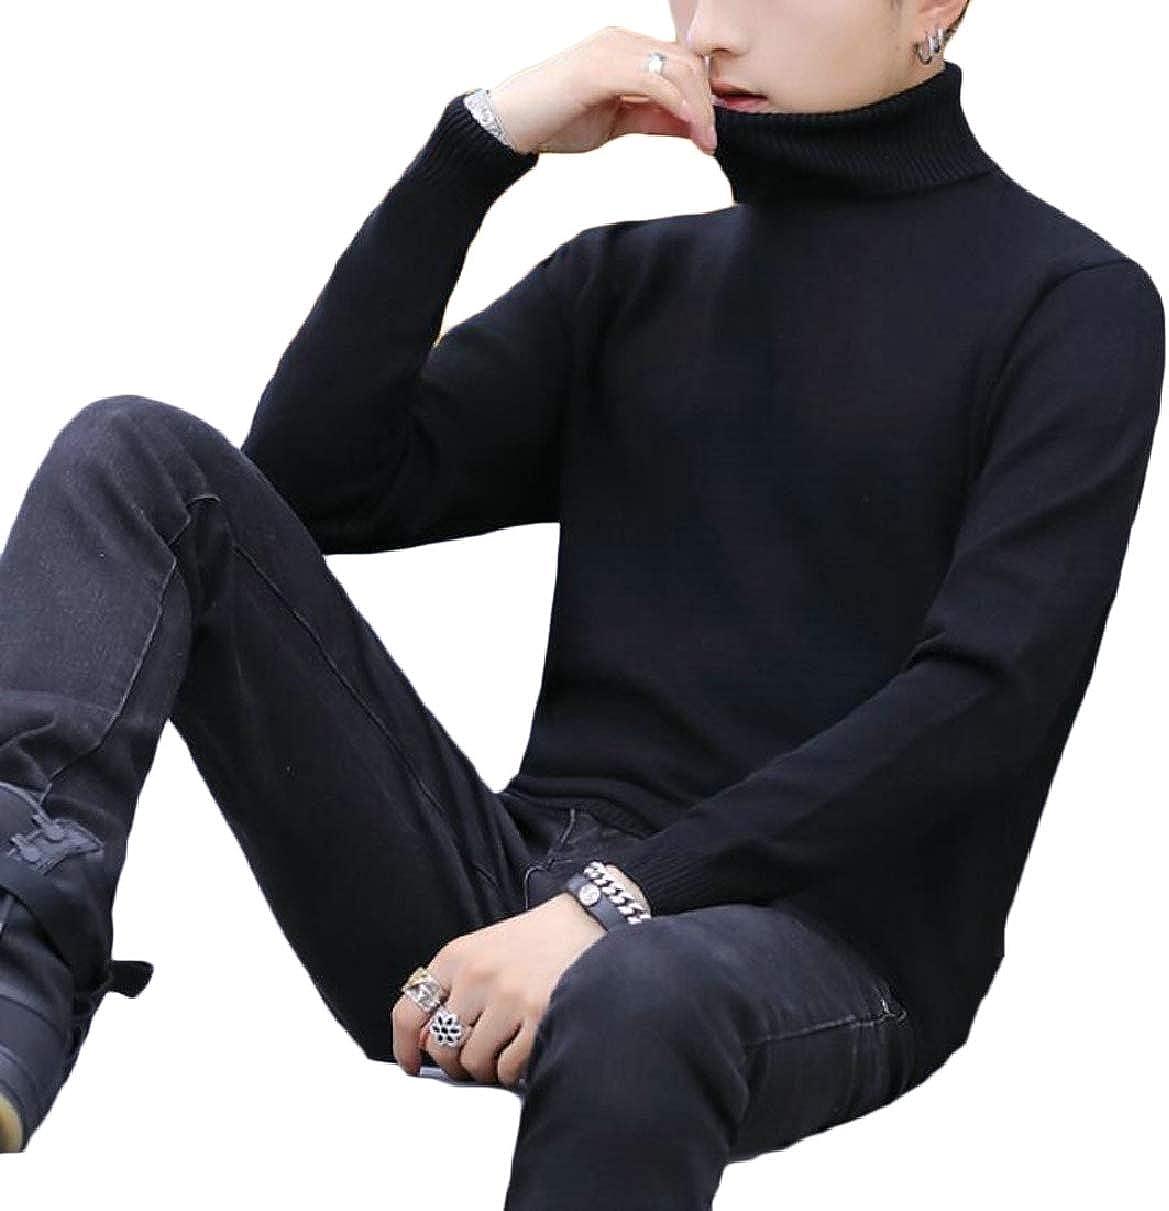 CBTLVSN Mens Long Sleeve Warm Knitwear Solid Pullover Turtleneck Sweater